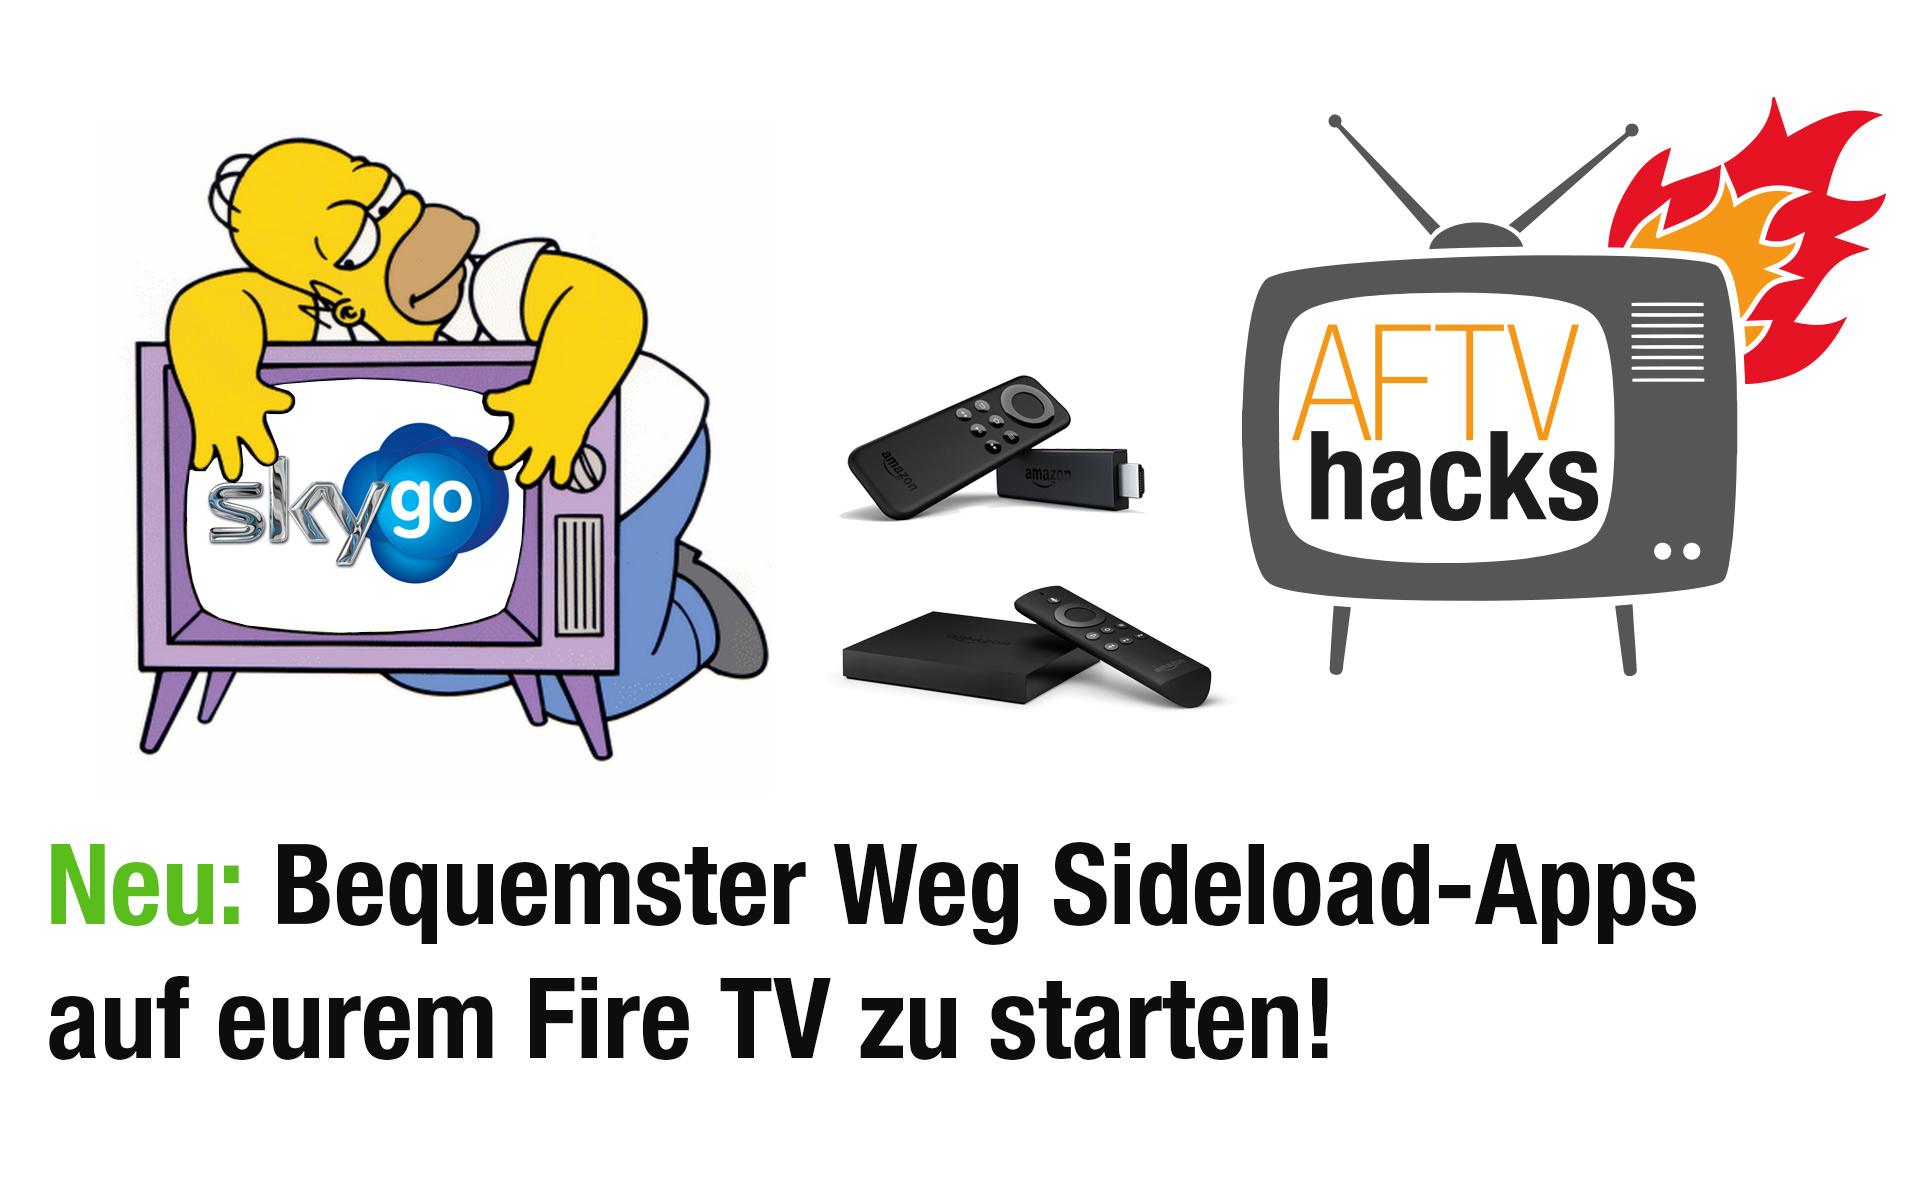 Sideload-Apps (Kodi, SkyGo) bequem auf dem Fire TV starten